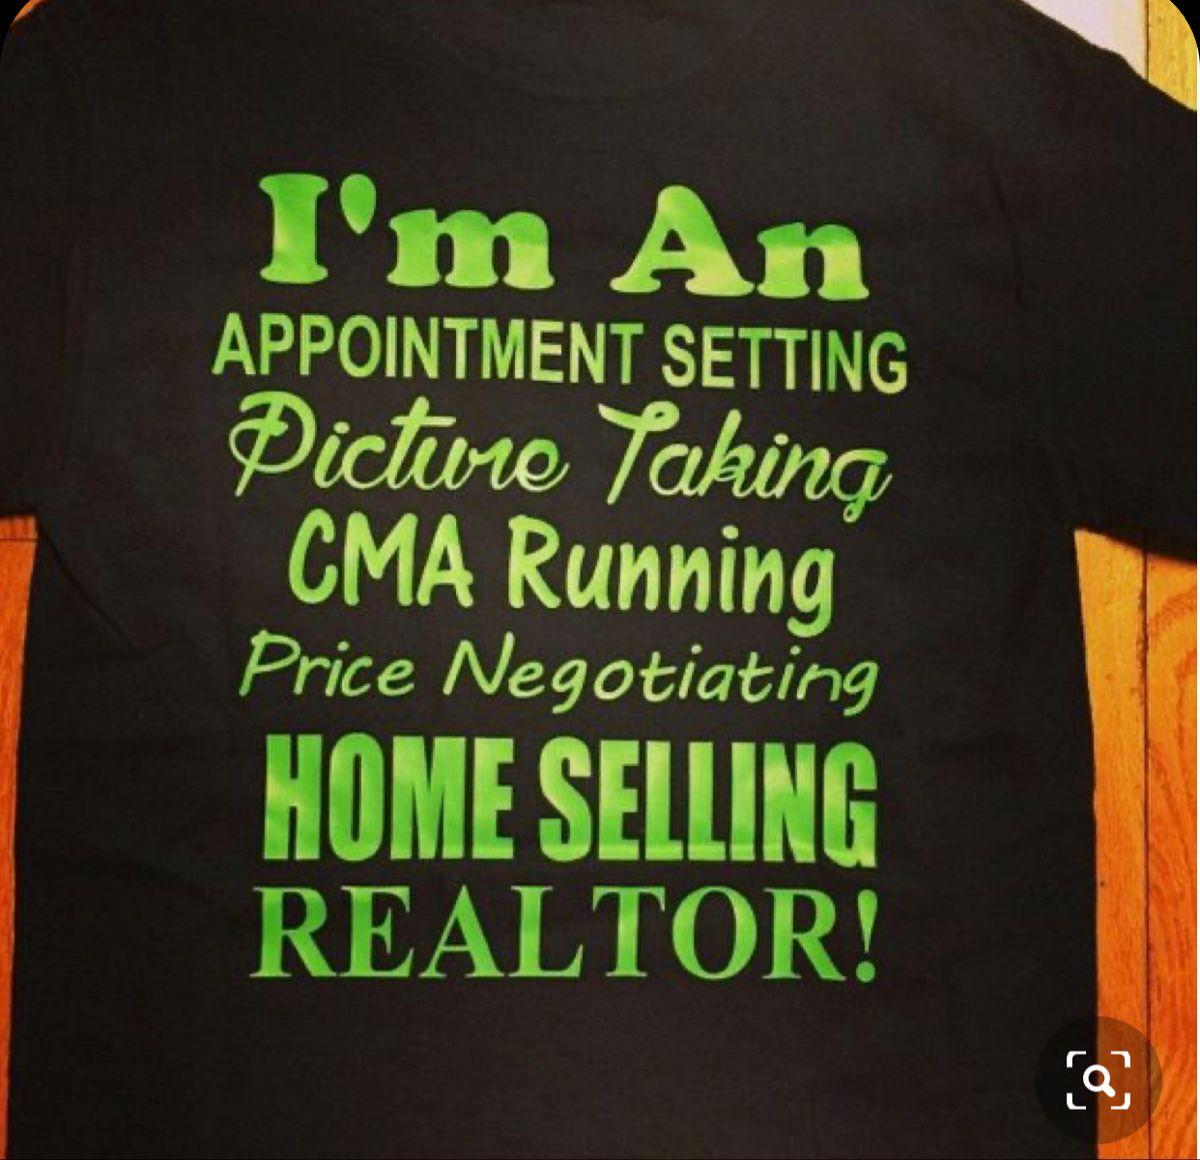 #experiencethedifference #sellingrealestate # #buyhomes #realtorlife  #makingdreamsreality #shoppingforahome